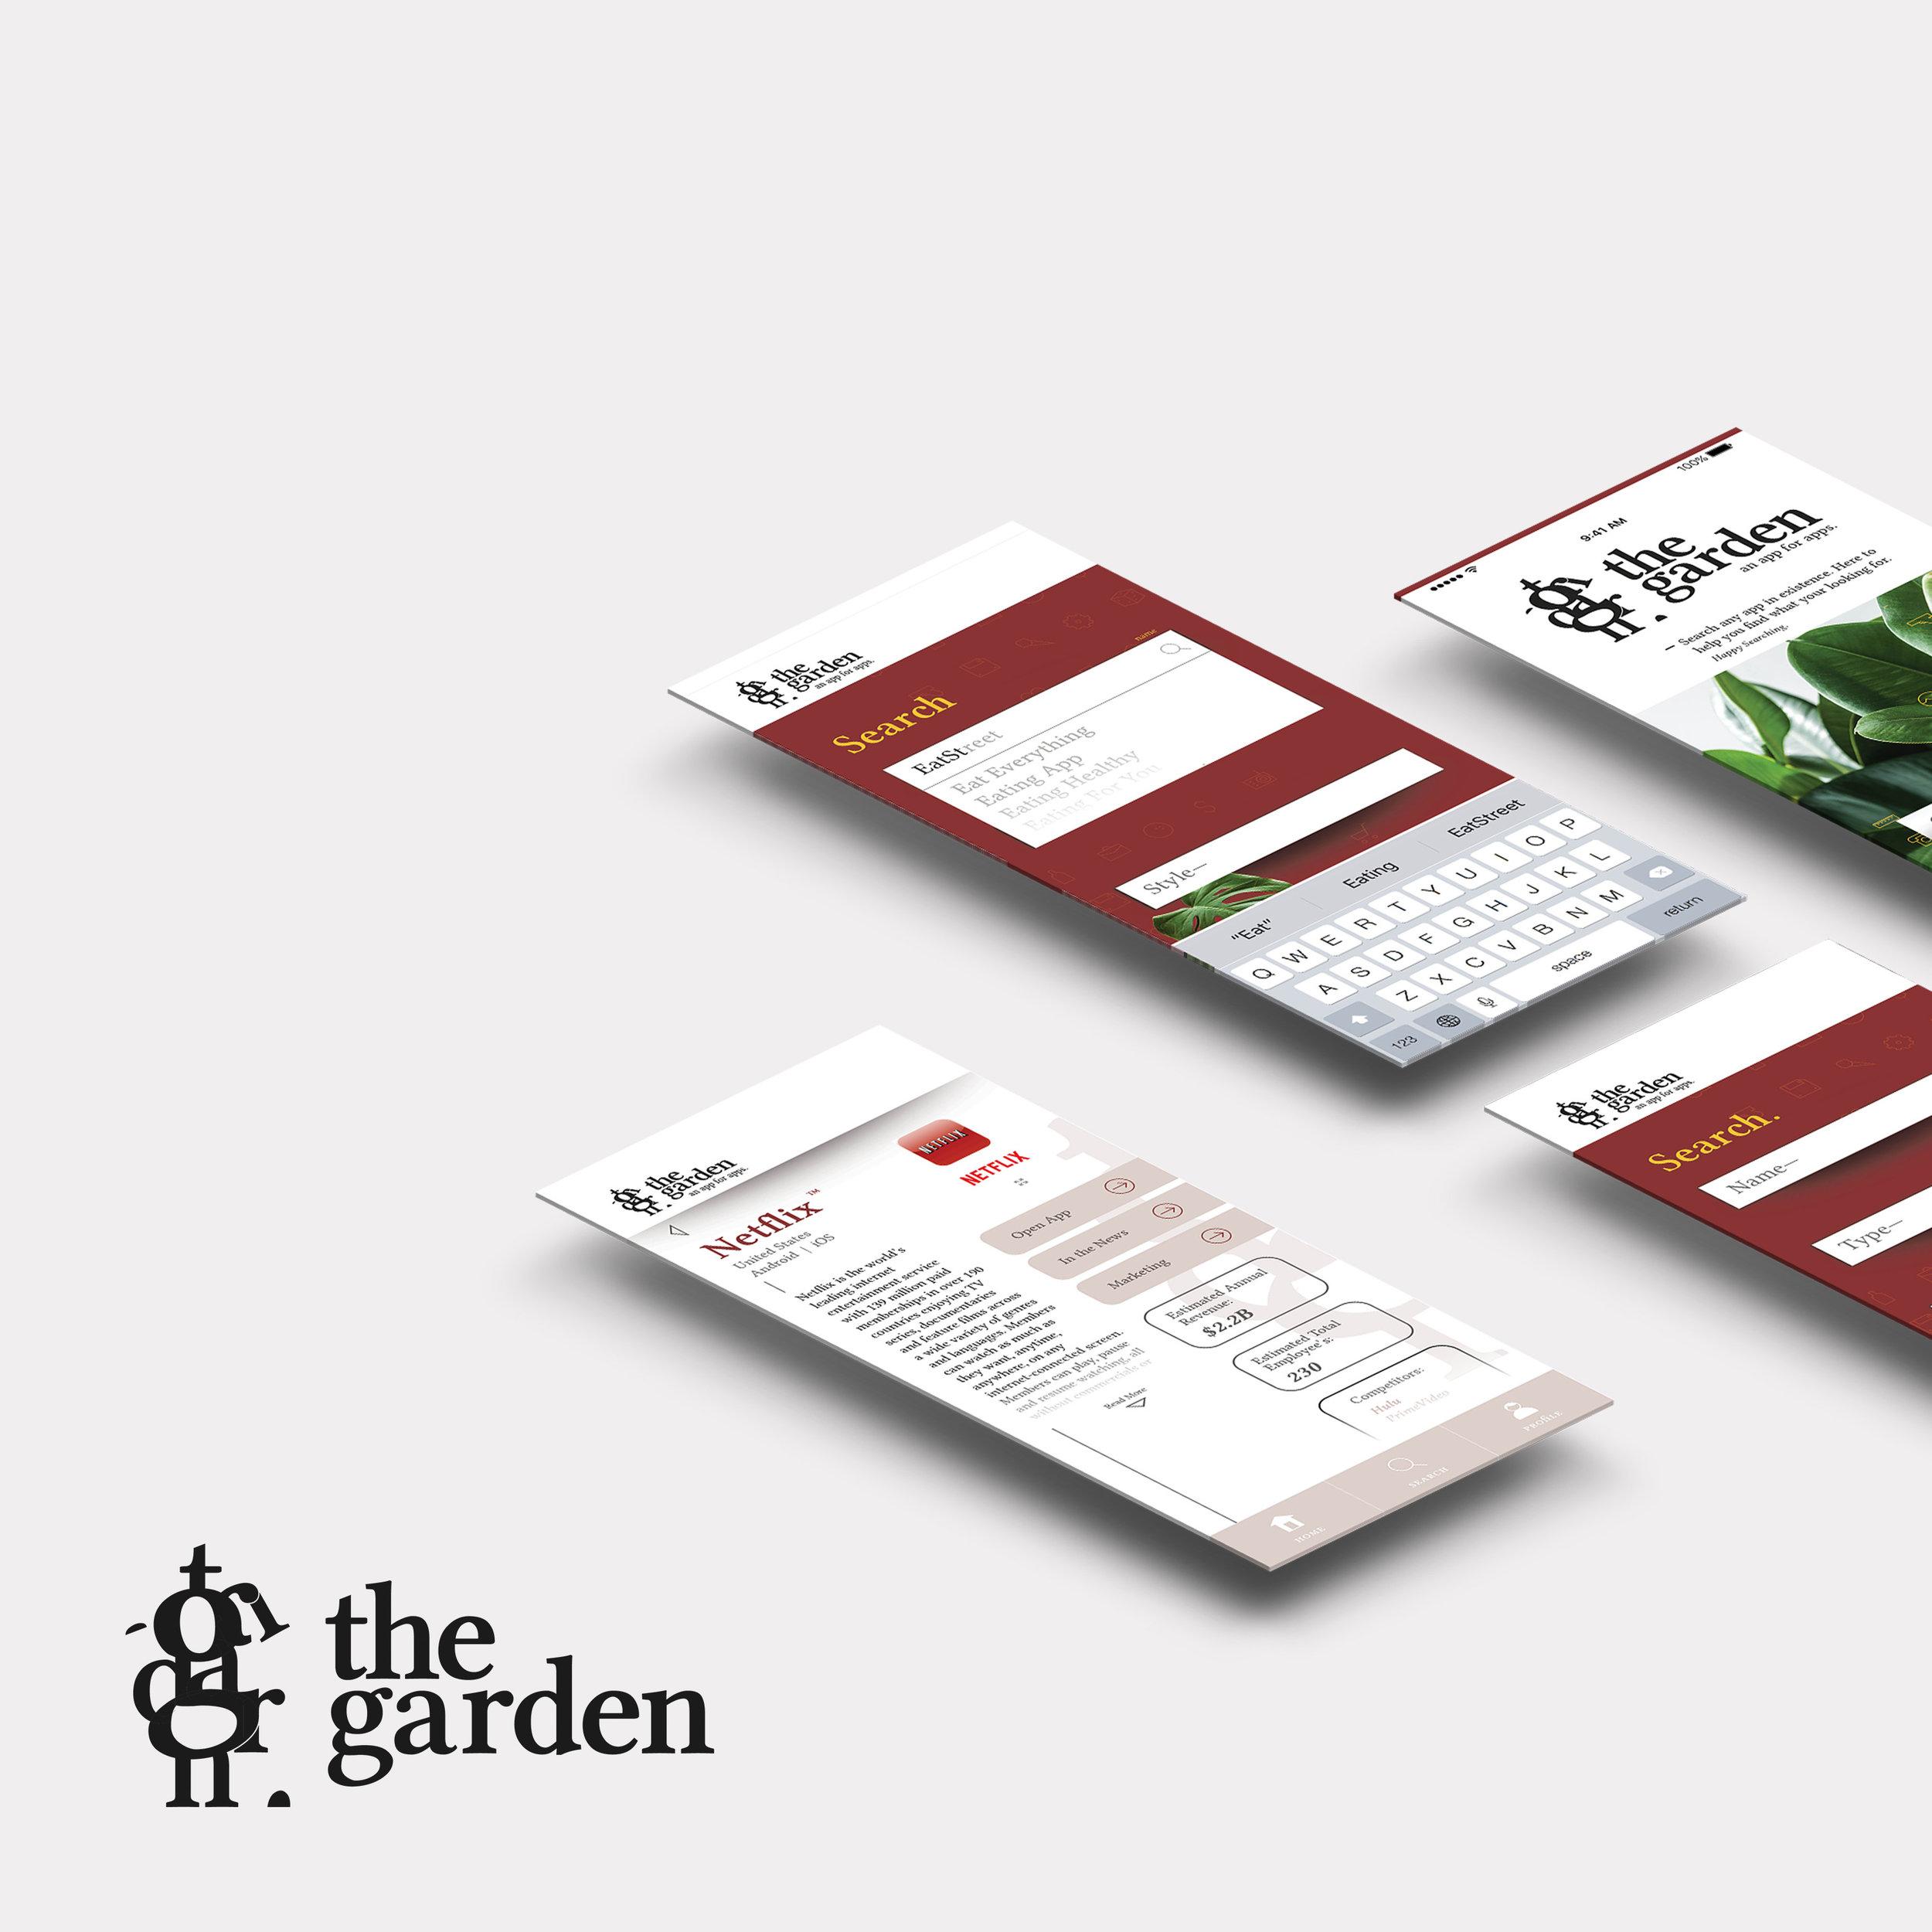 Mahr design_the garden_insta1.jpg